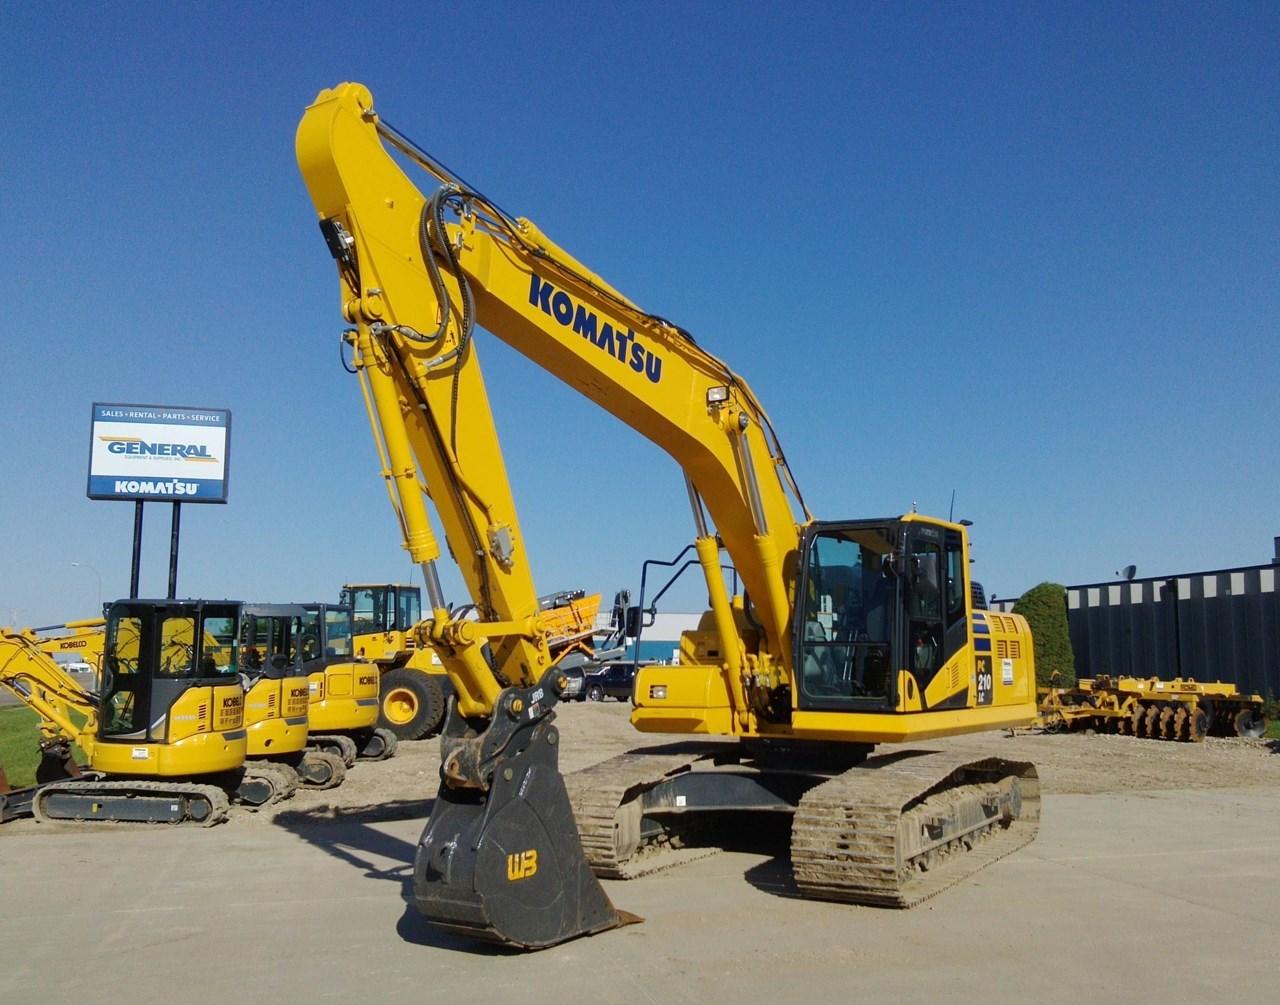 2018 Komatsu PC210LC-11 Excavator For Sale